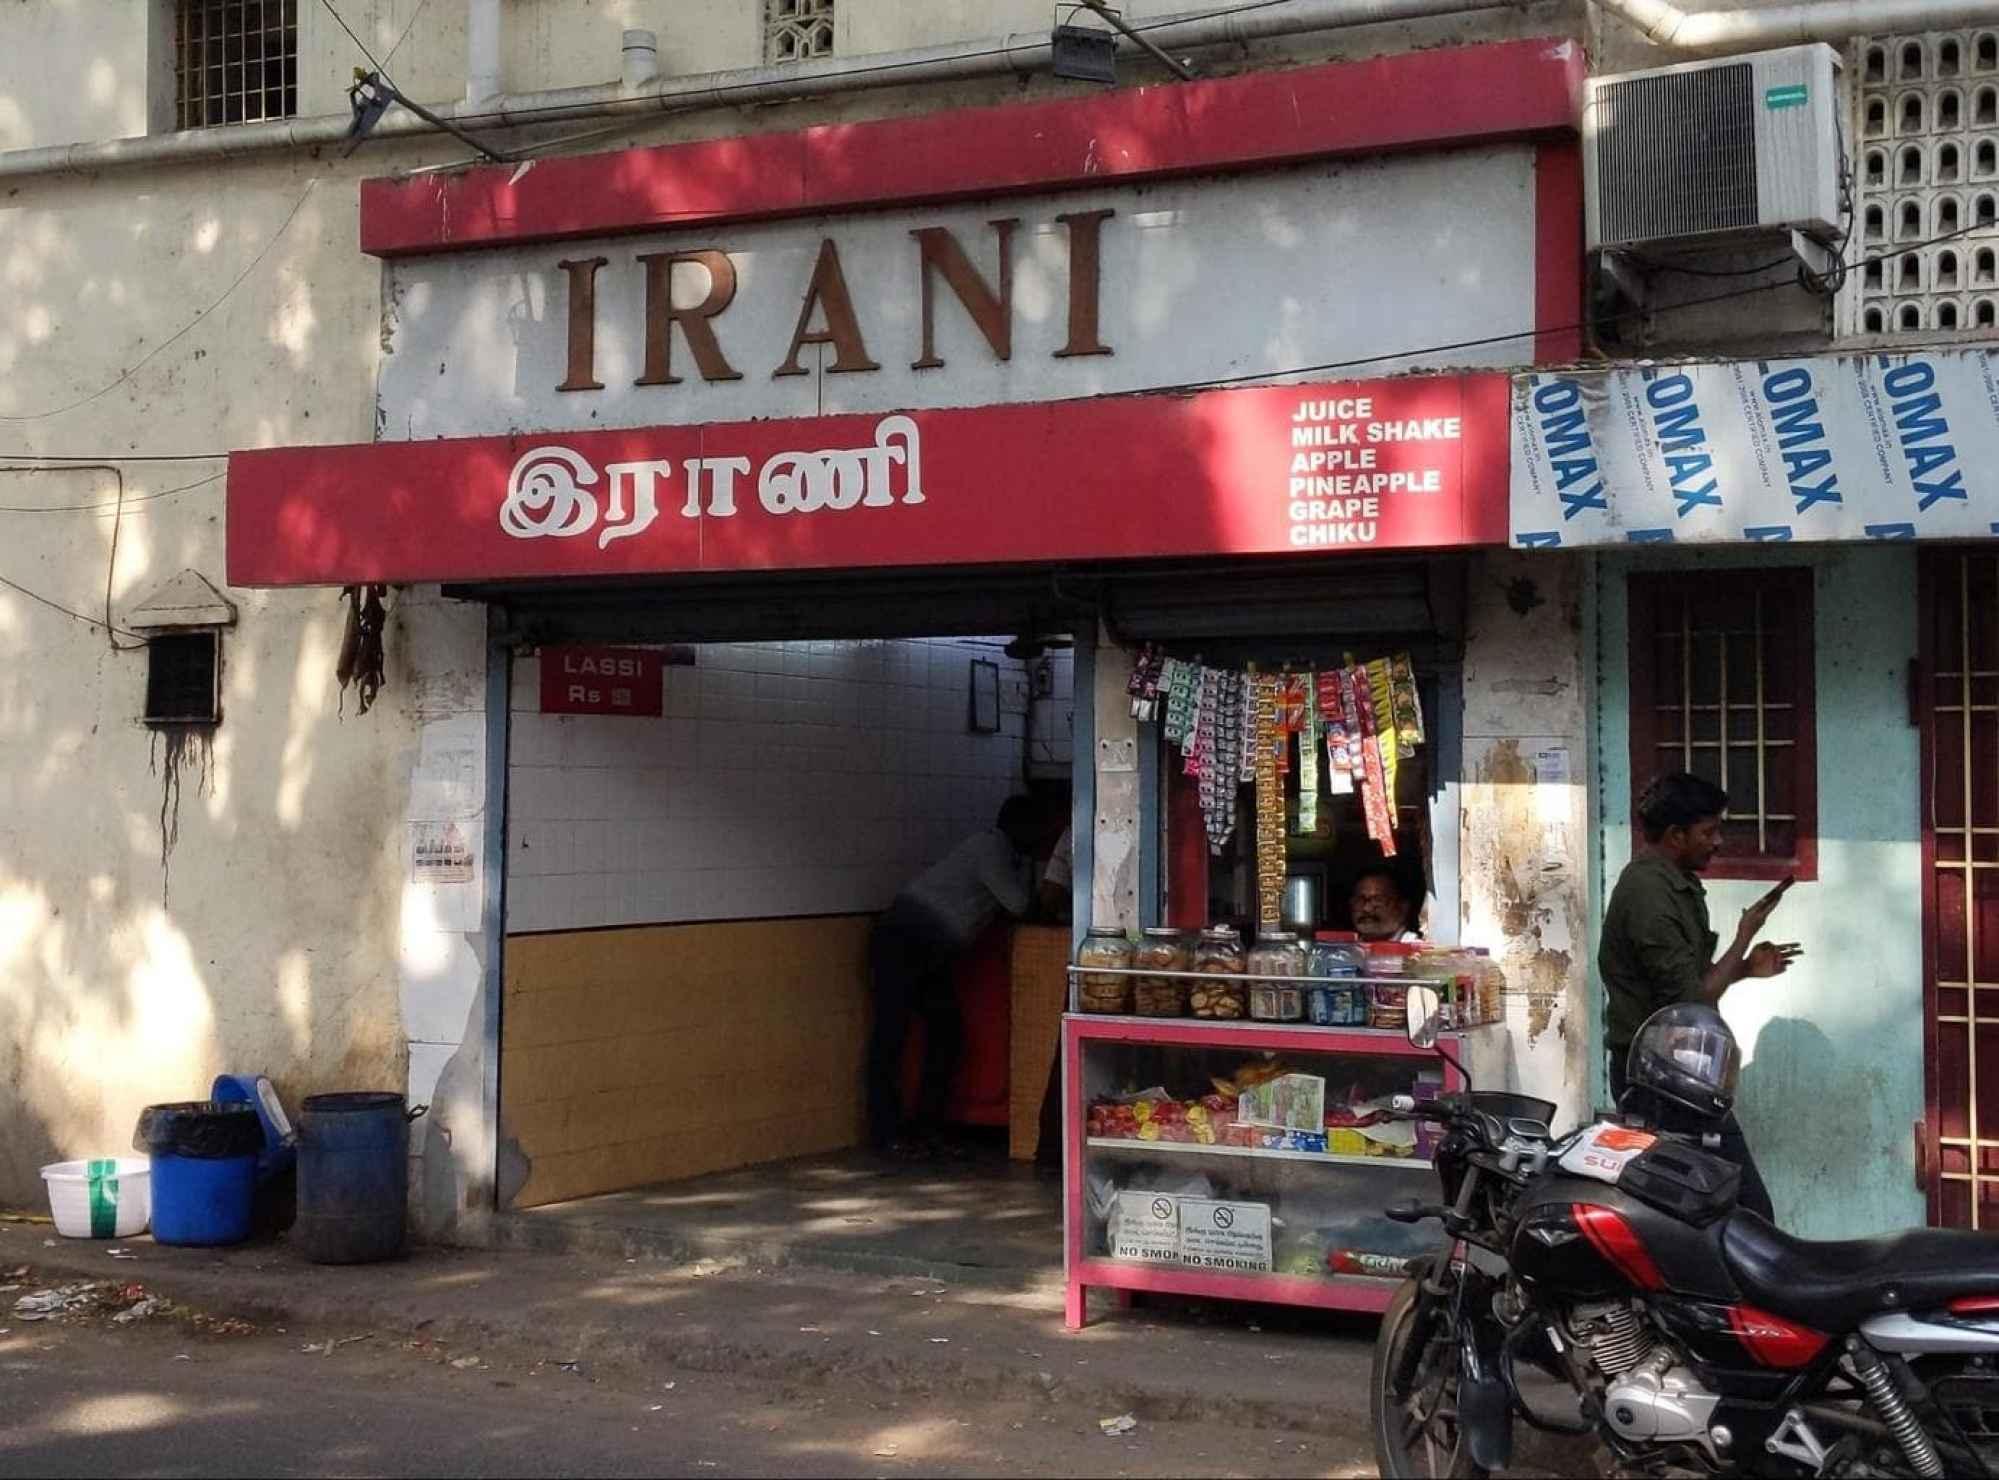 Irani Tea Stall